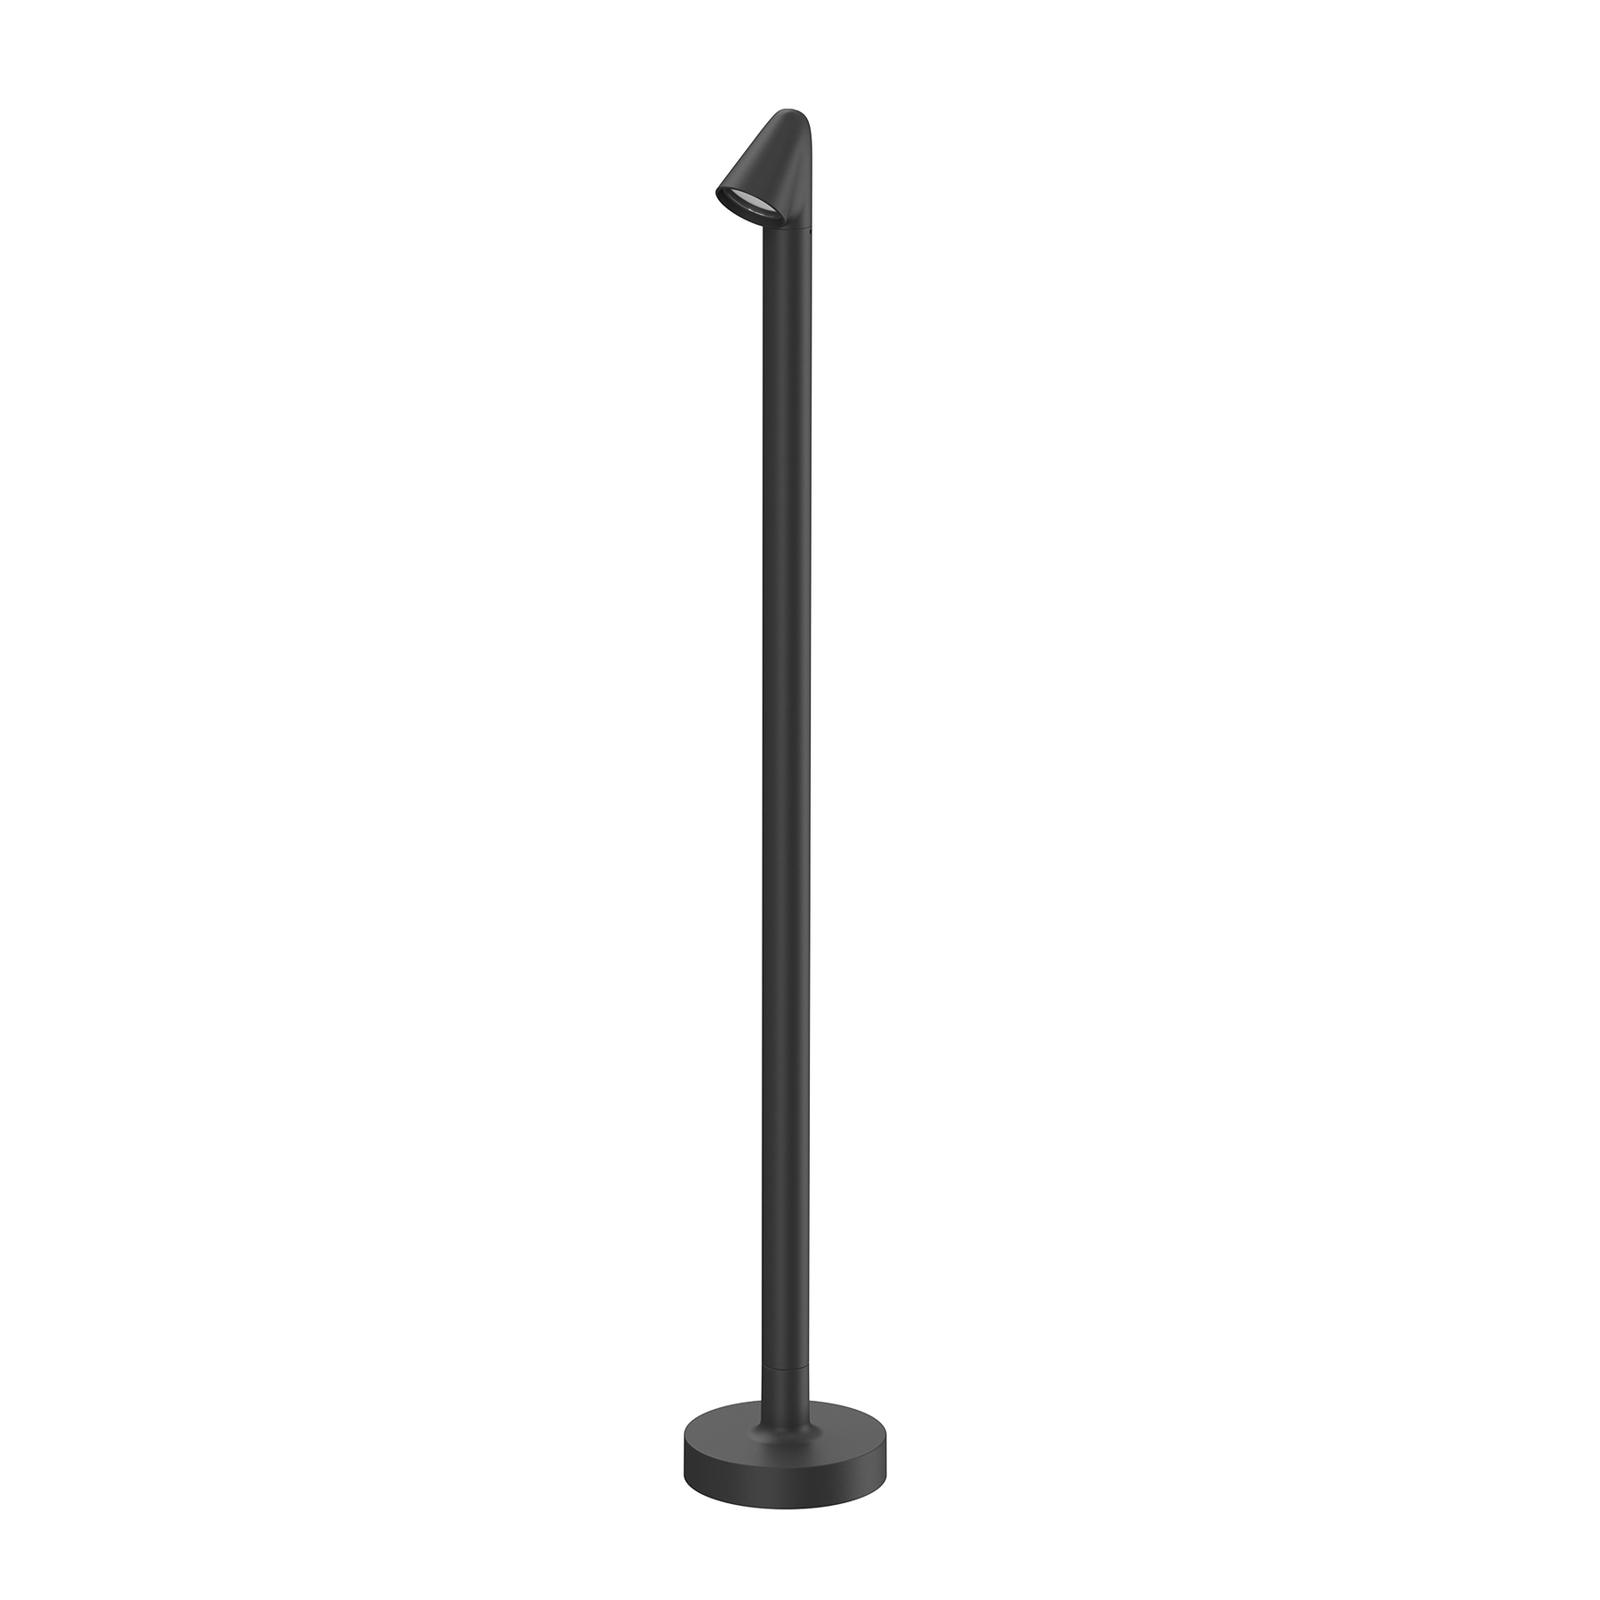 FLOS Walkstick 2 gånglampa 2700K, svart